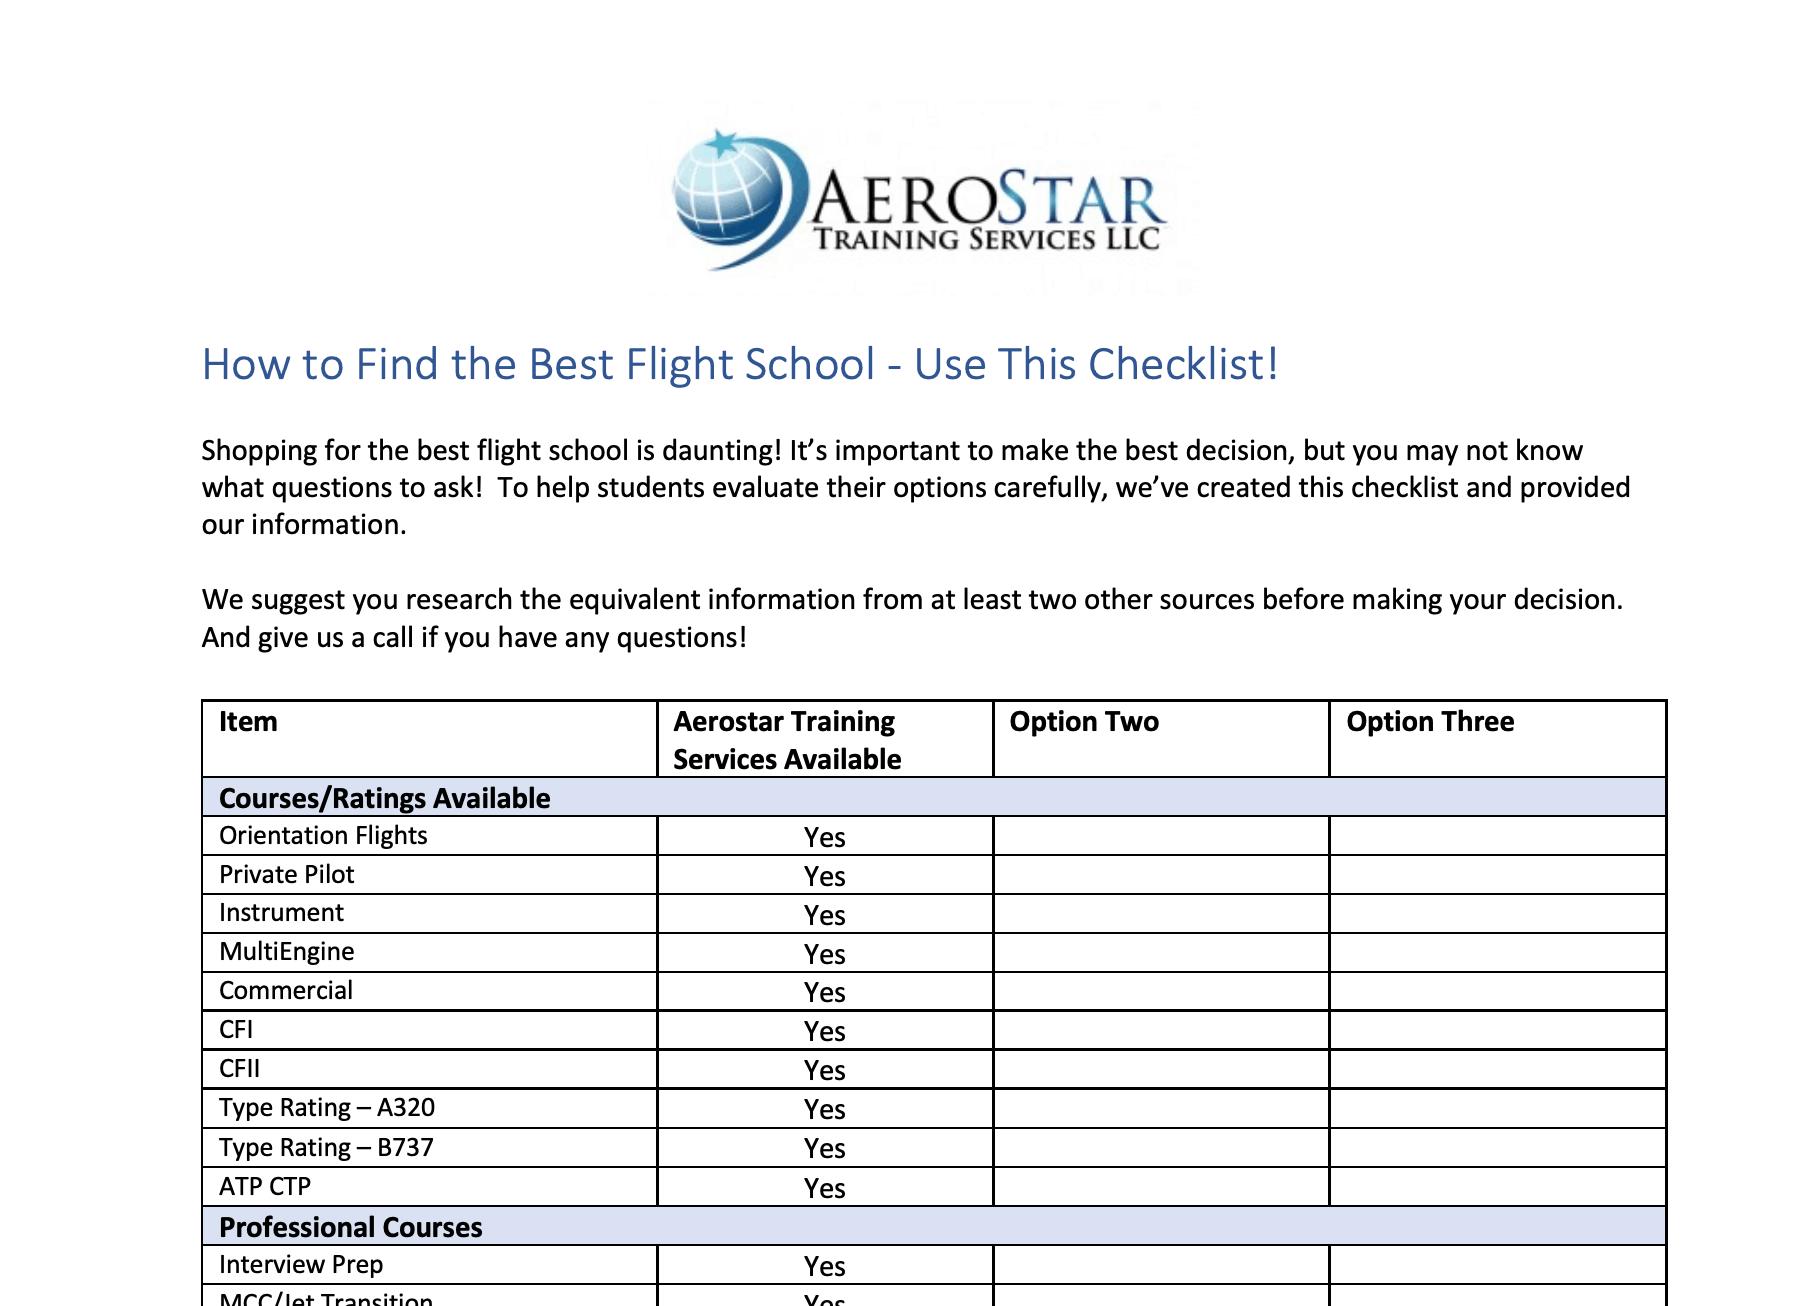 How to Find the Best Flight School - Checklist